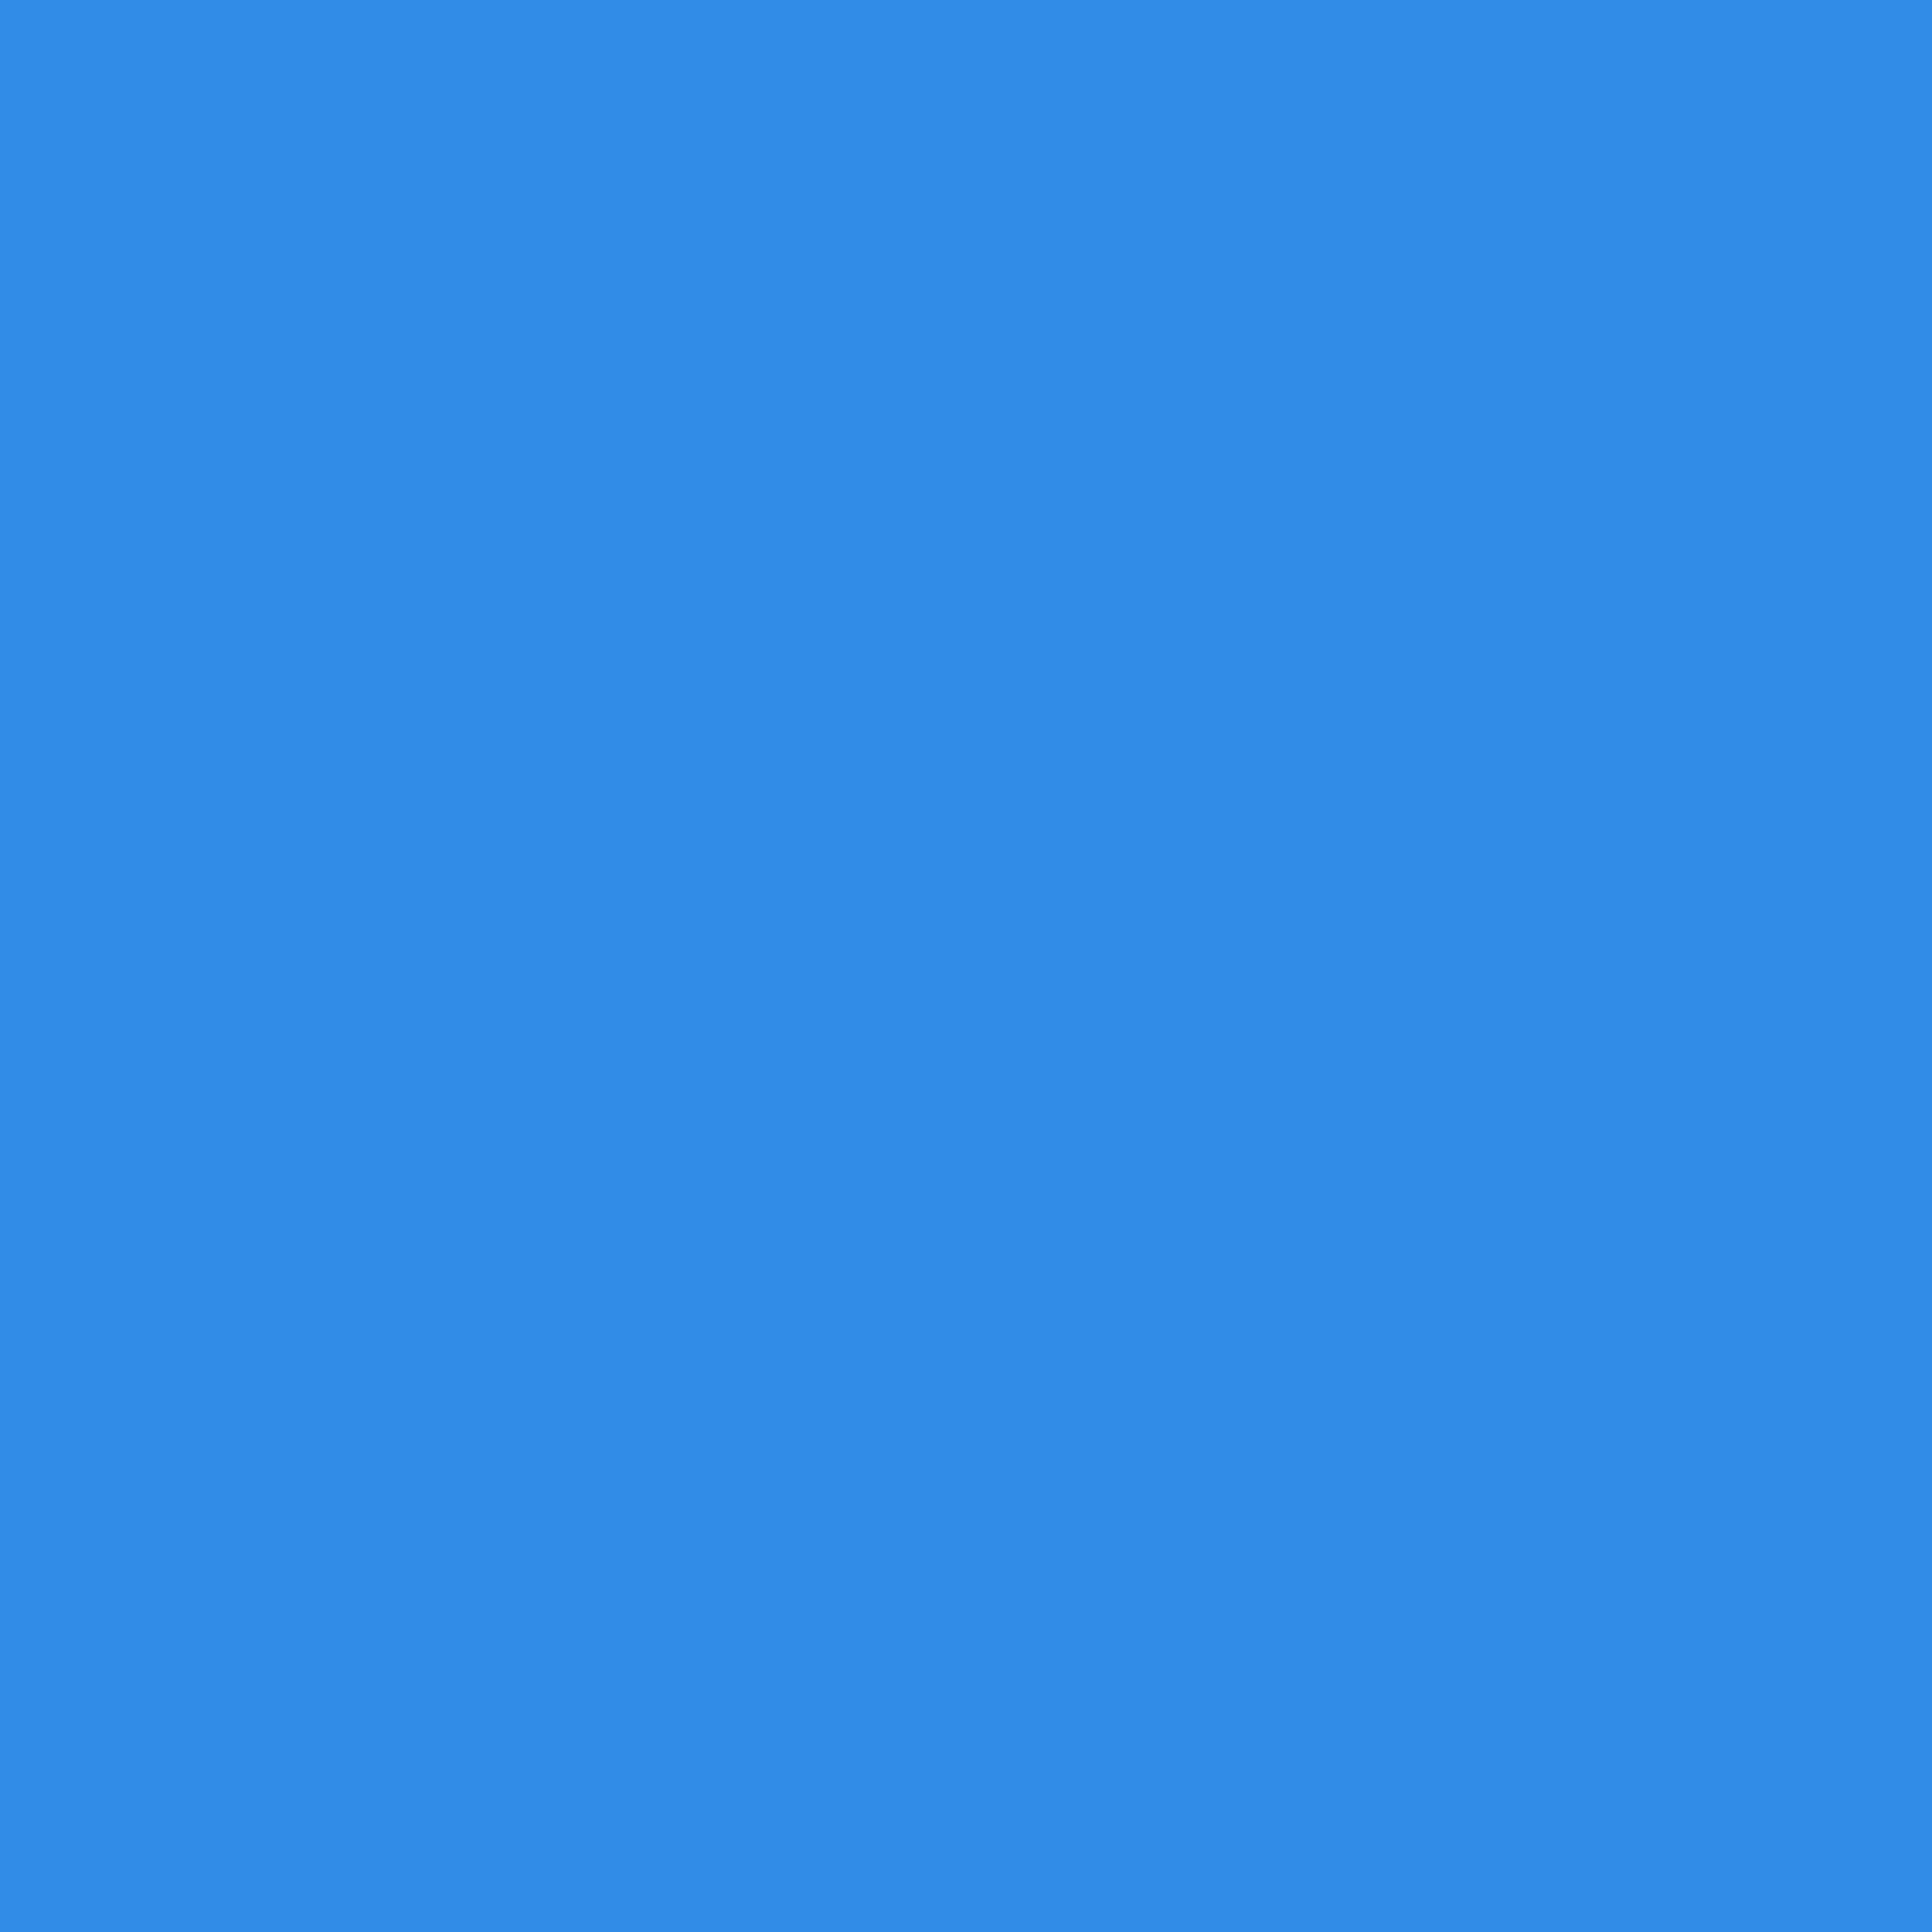 3600x3600 Bleu De France Solid Color Background